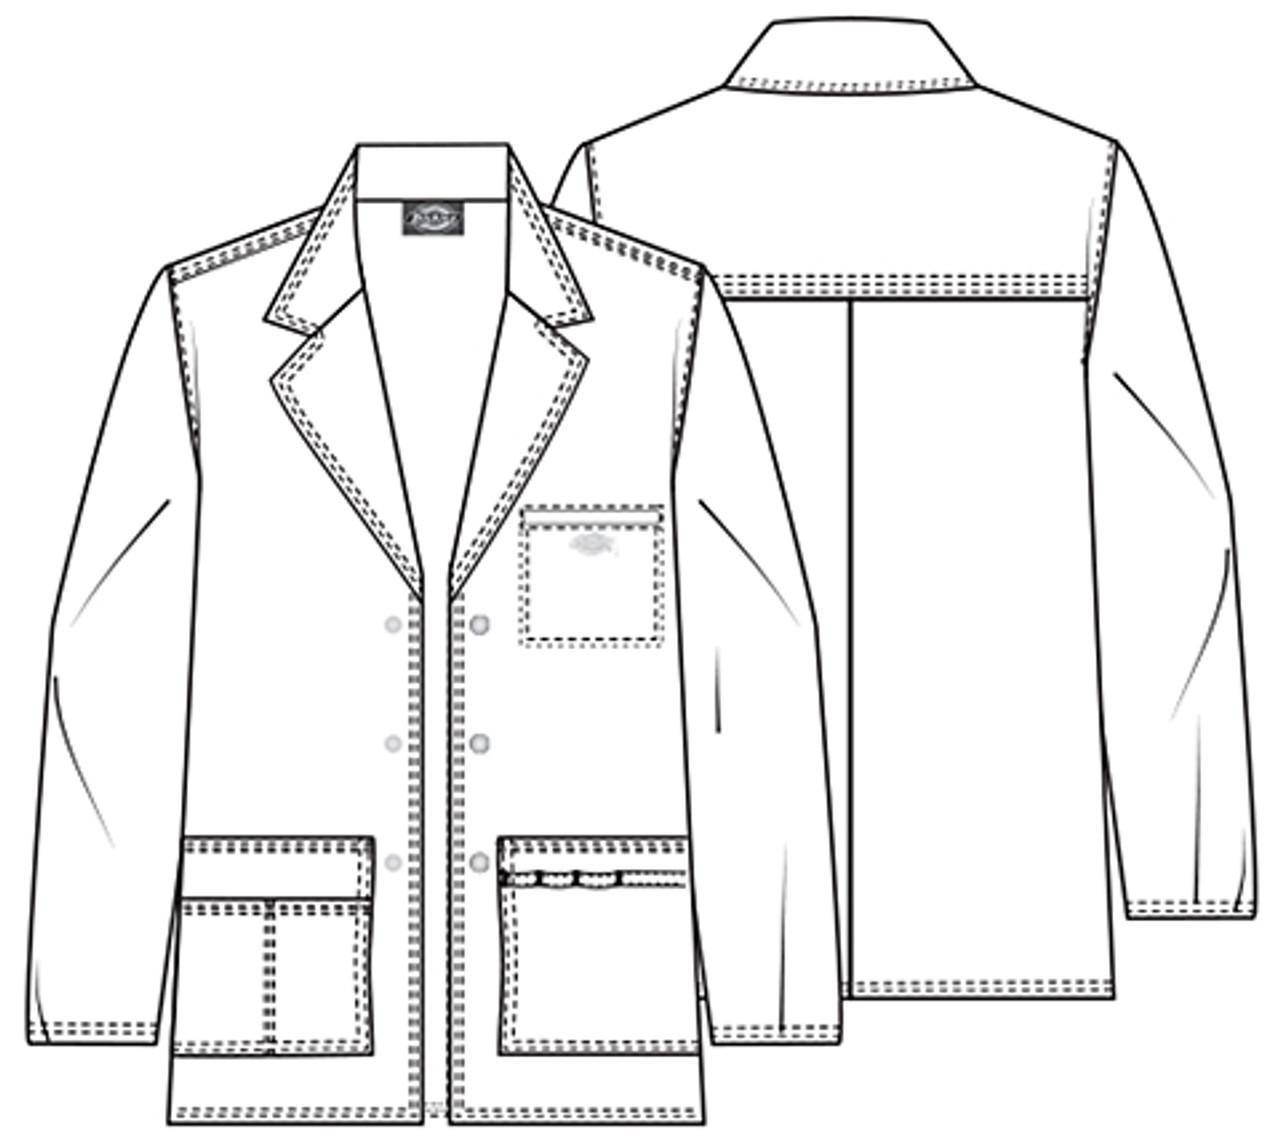 81403 Mens Lab Coat Details